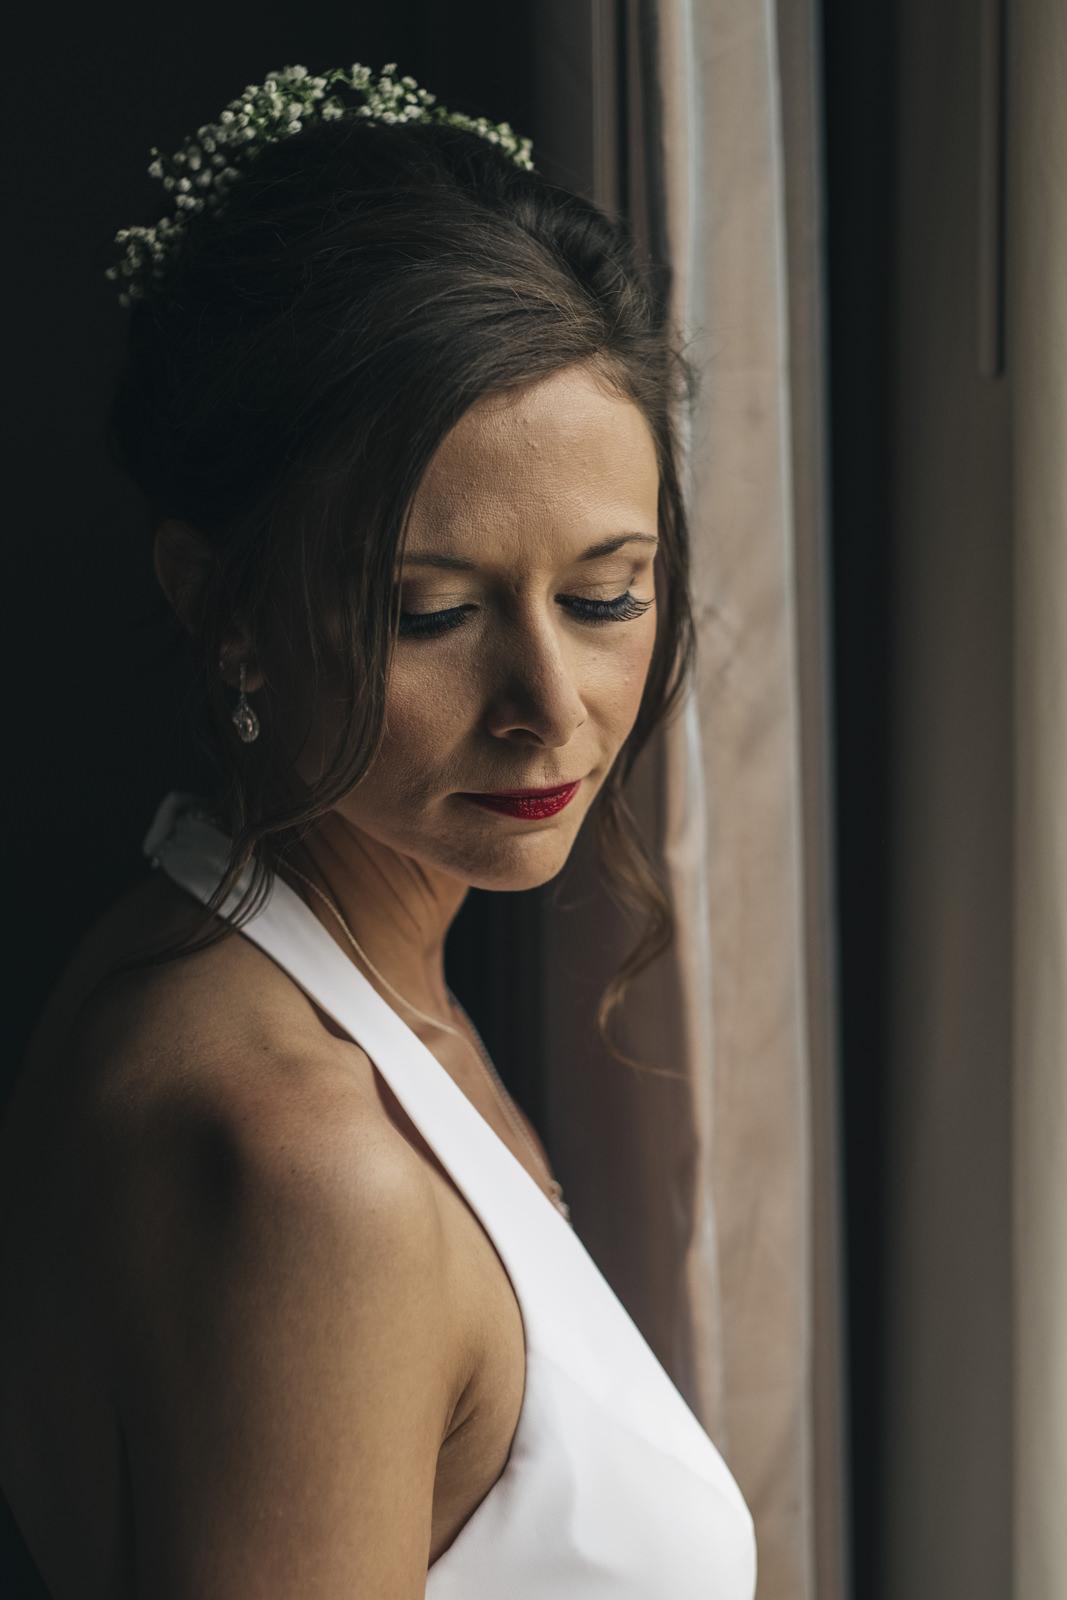 Portrait of the bride before her elopement.